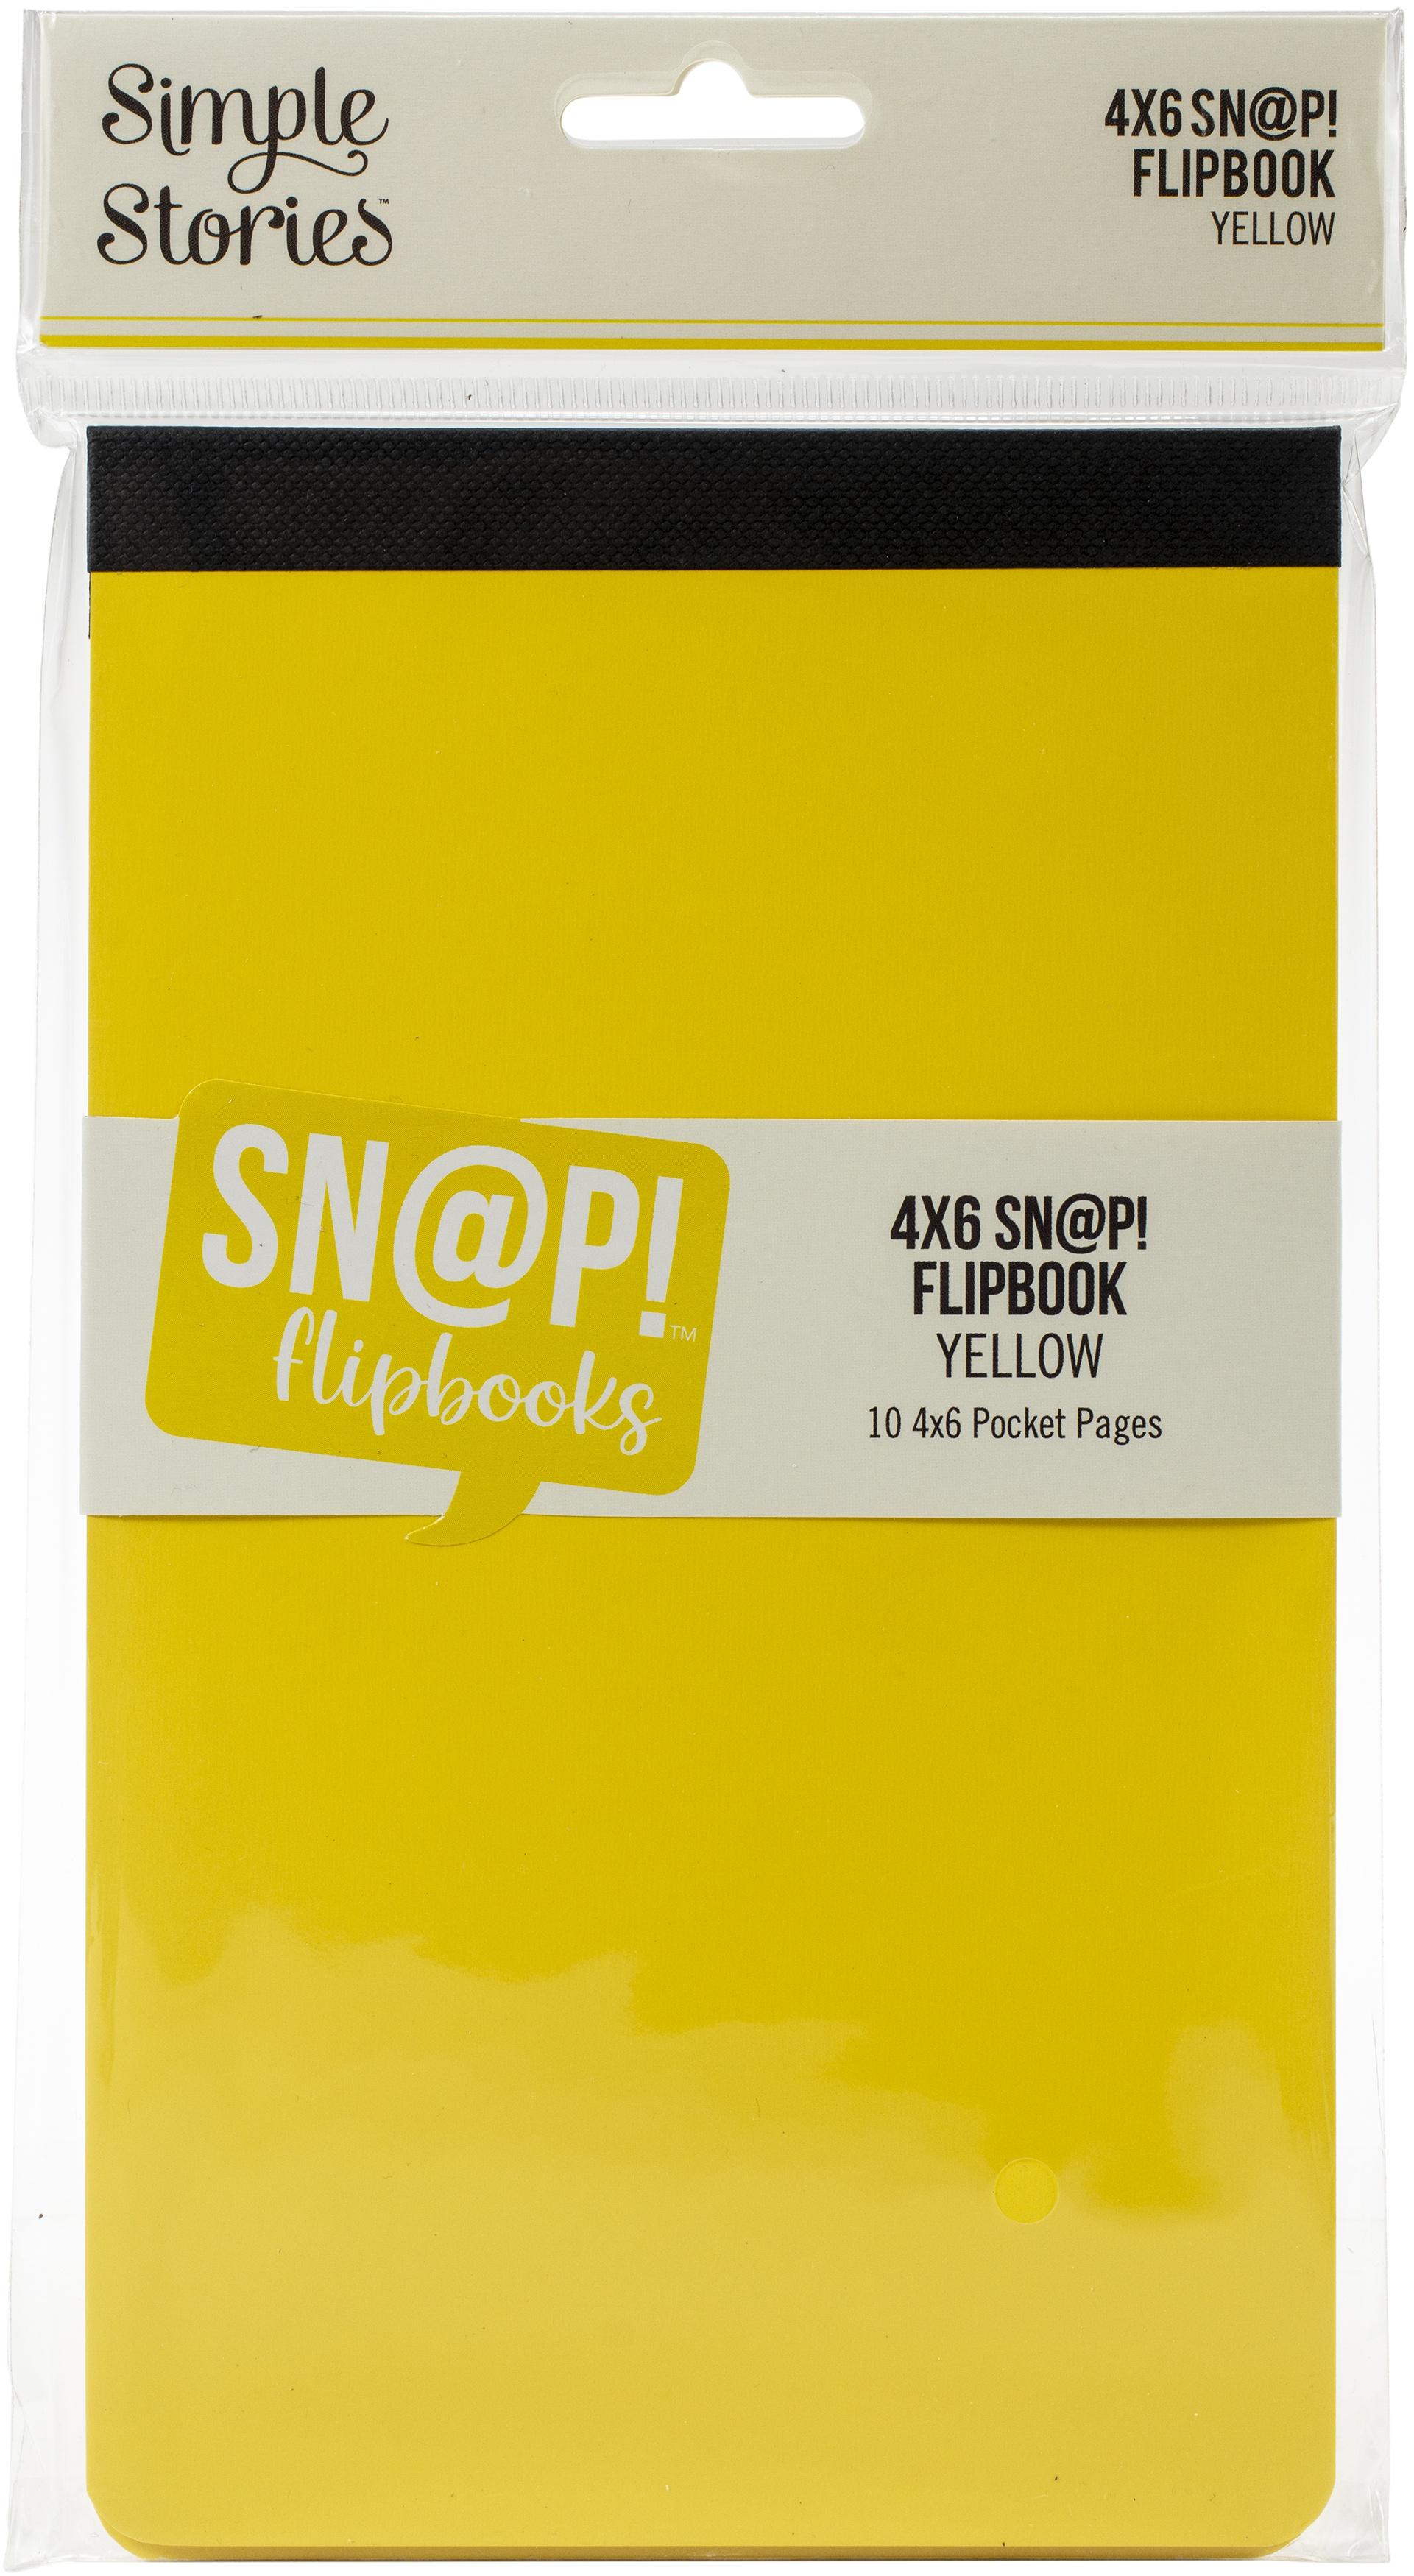 Simple Stories Sn@p! Flipbook 4X6-Yellow